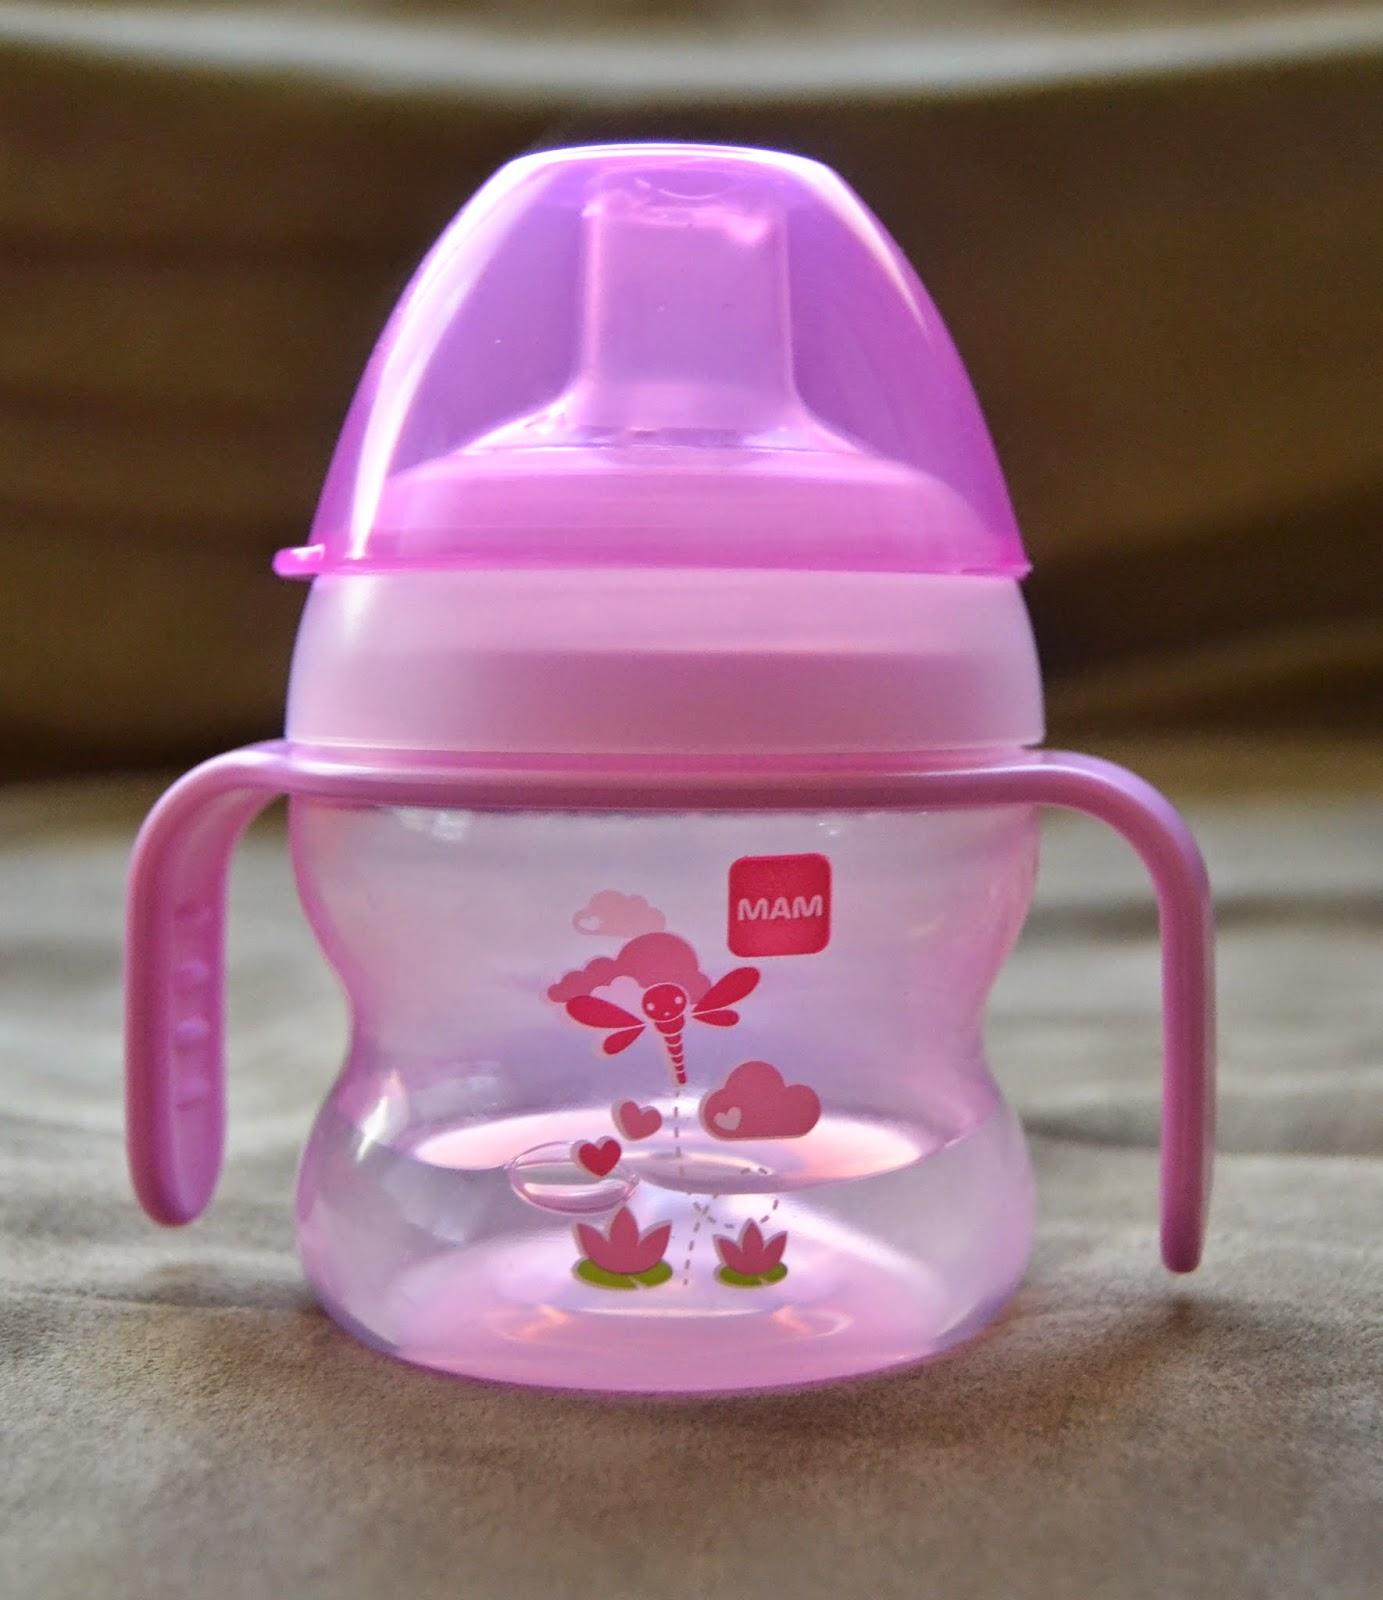 MAM Baby Starter Cup